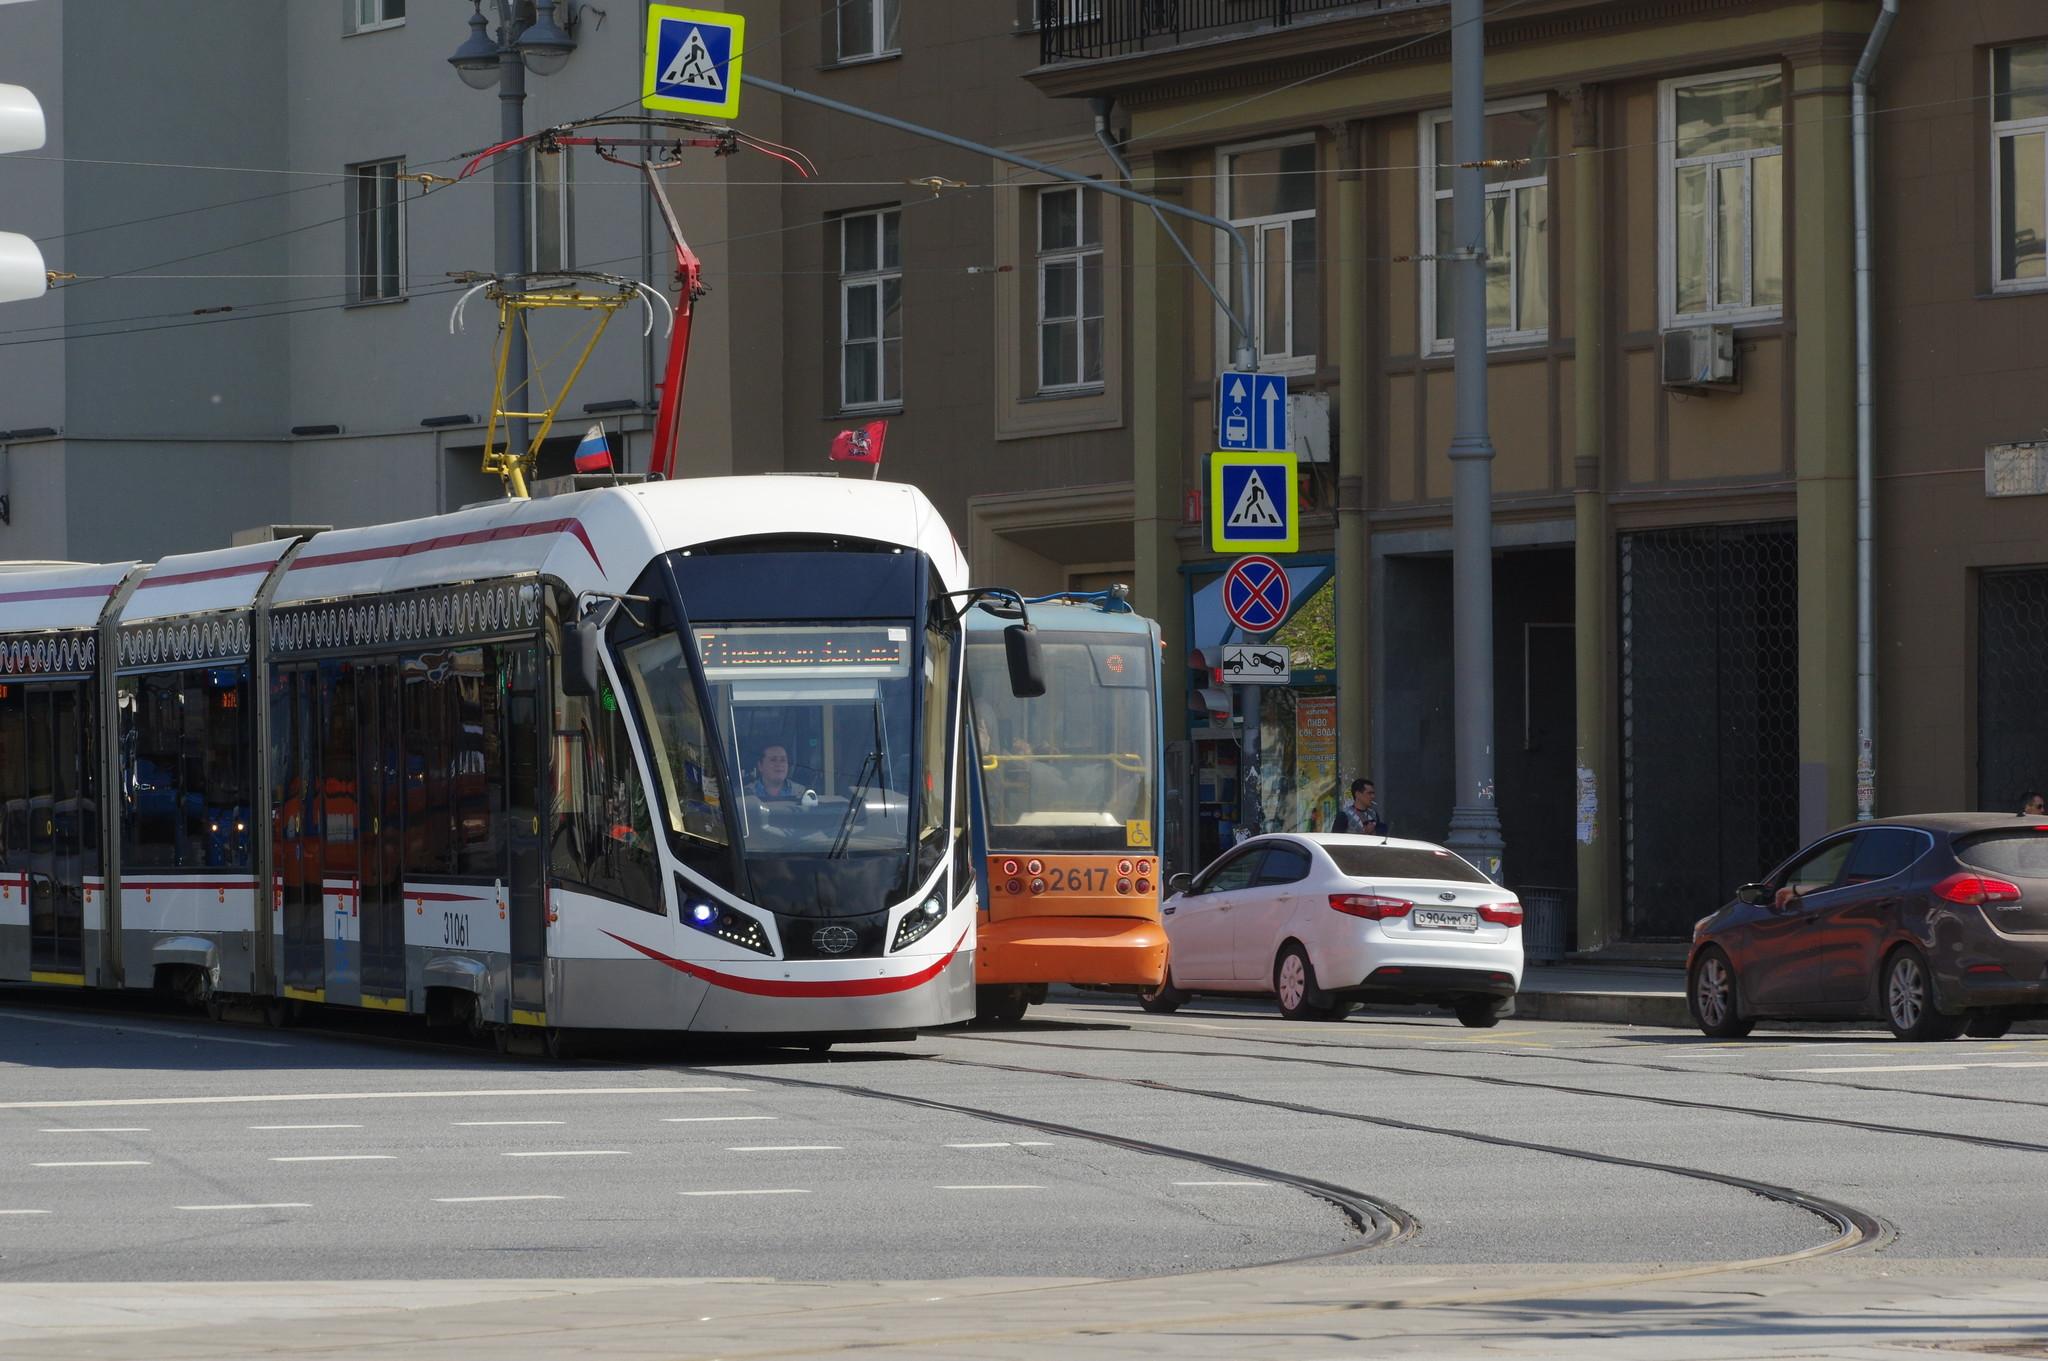 Трамвай 71-931М «Витязь-М», № 31061. Площадь Тверская Застава